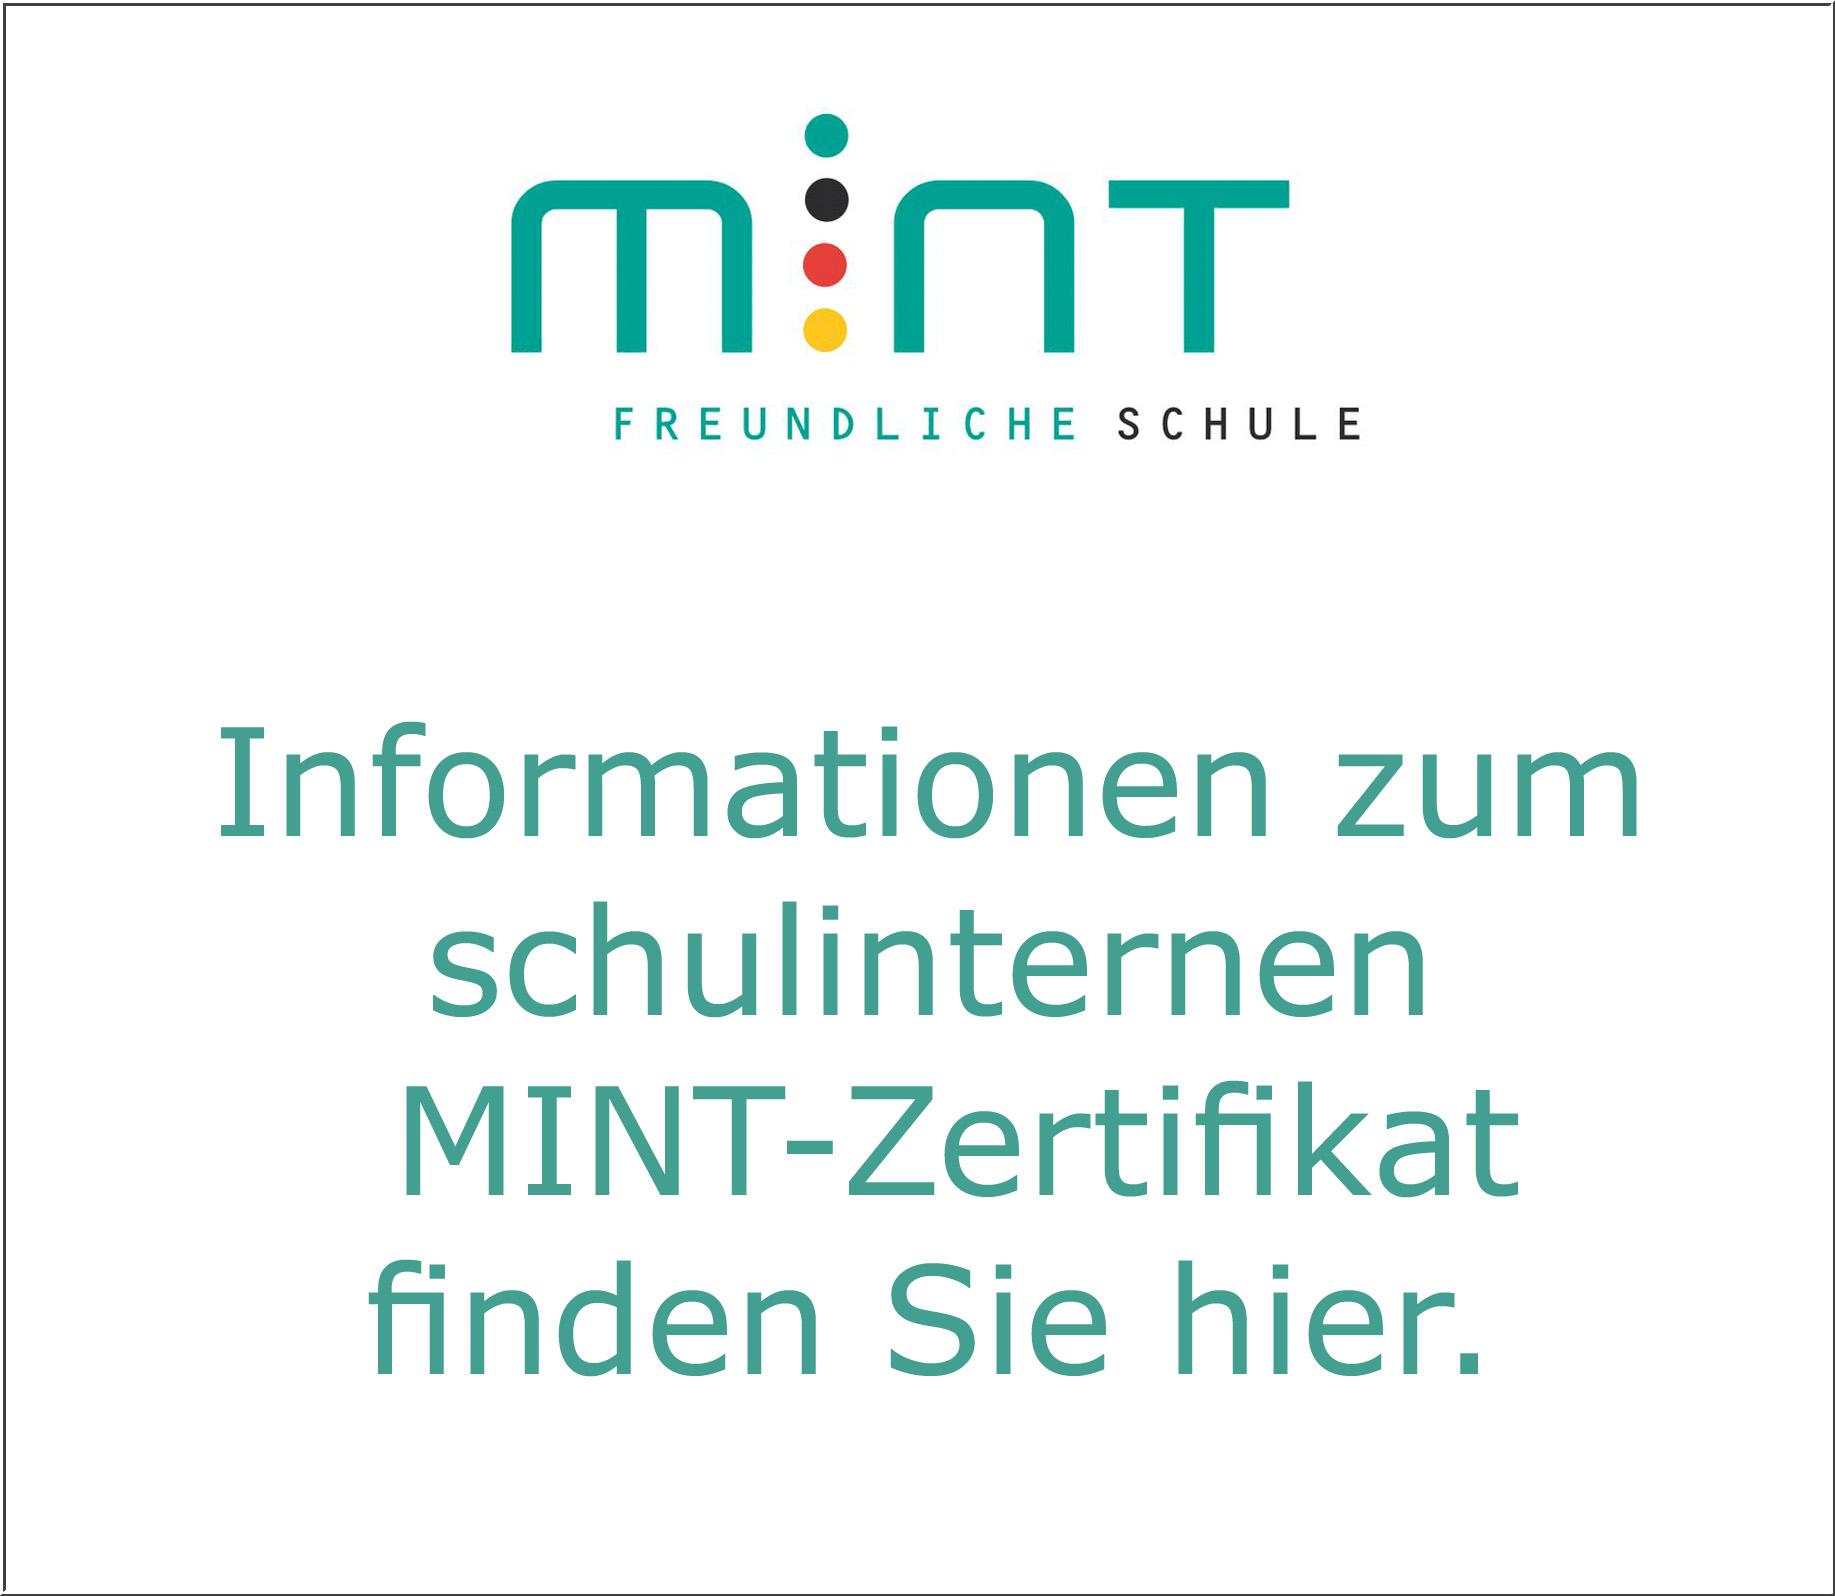 Schulinternes MINT-Zertifikat